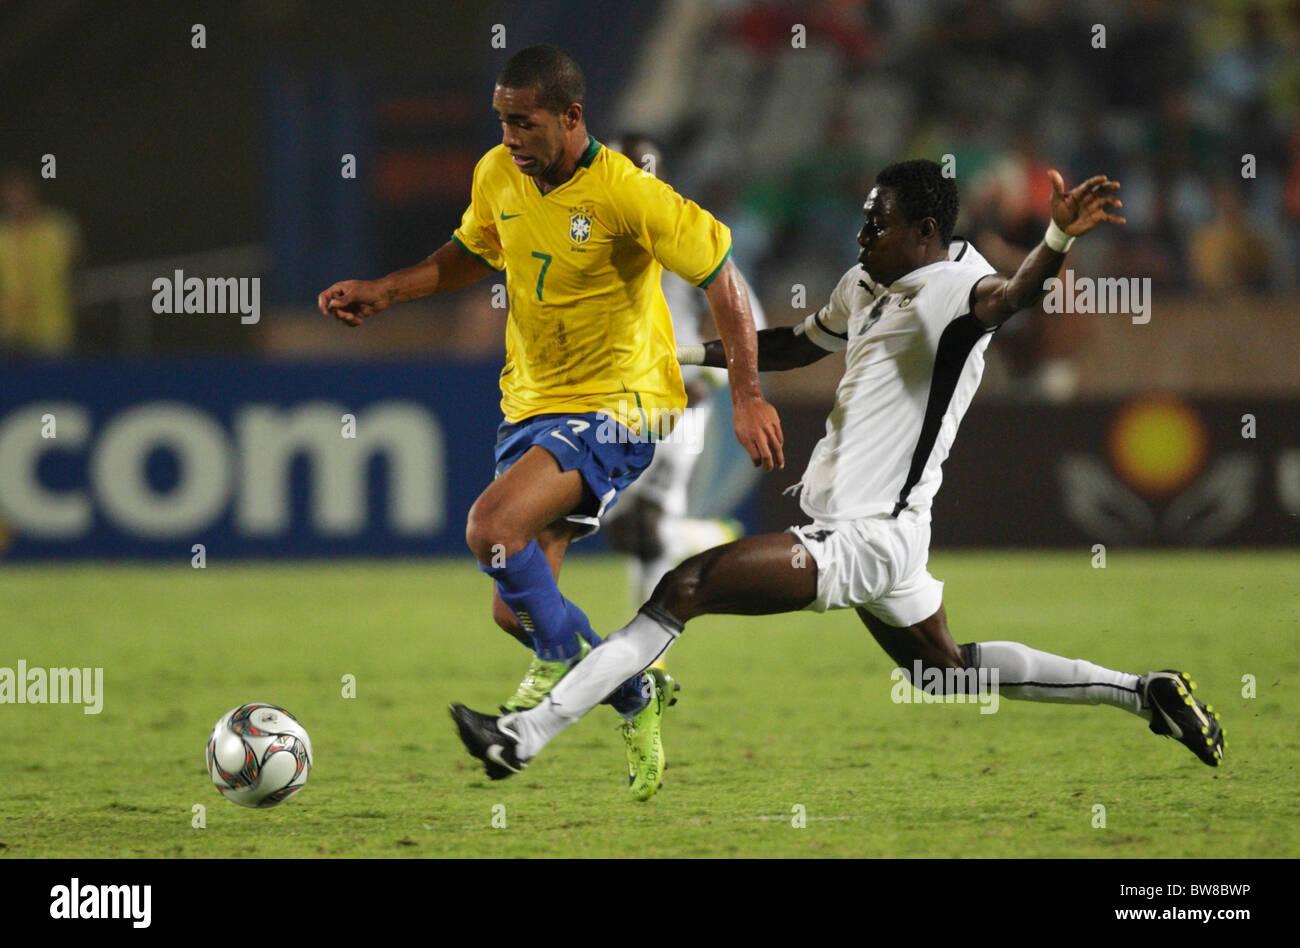 Daniel Addo of Ghana r tries to tackle Alex Teixeira of Brazil